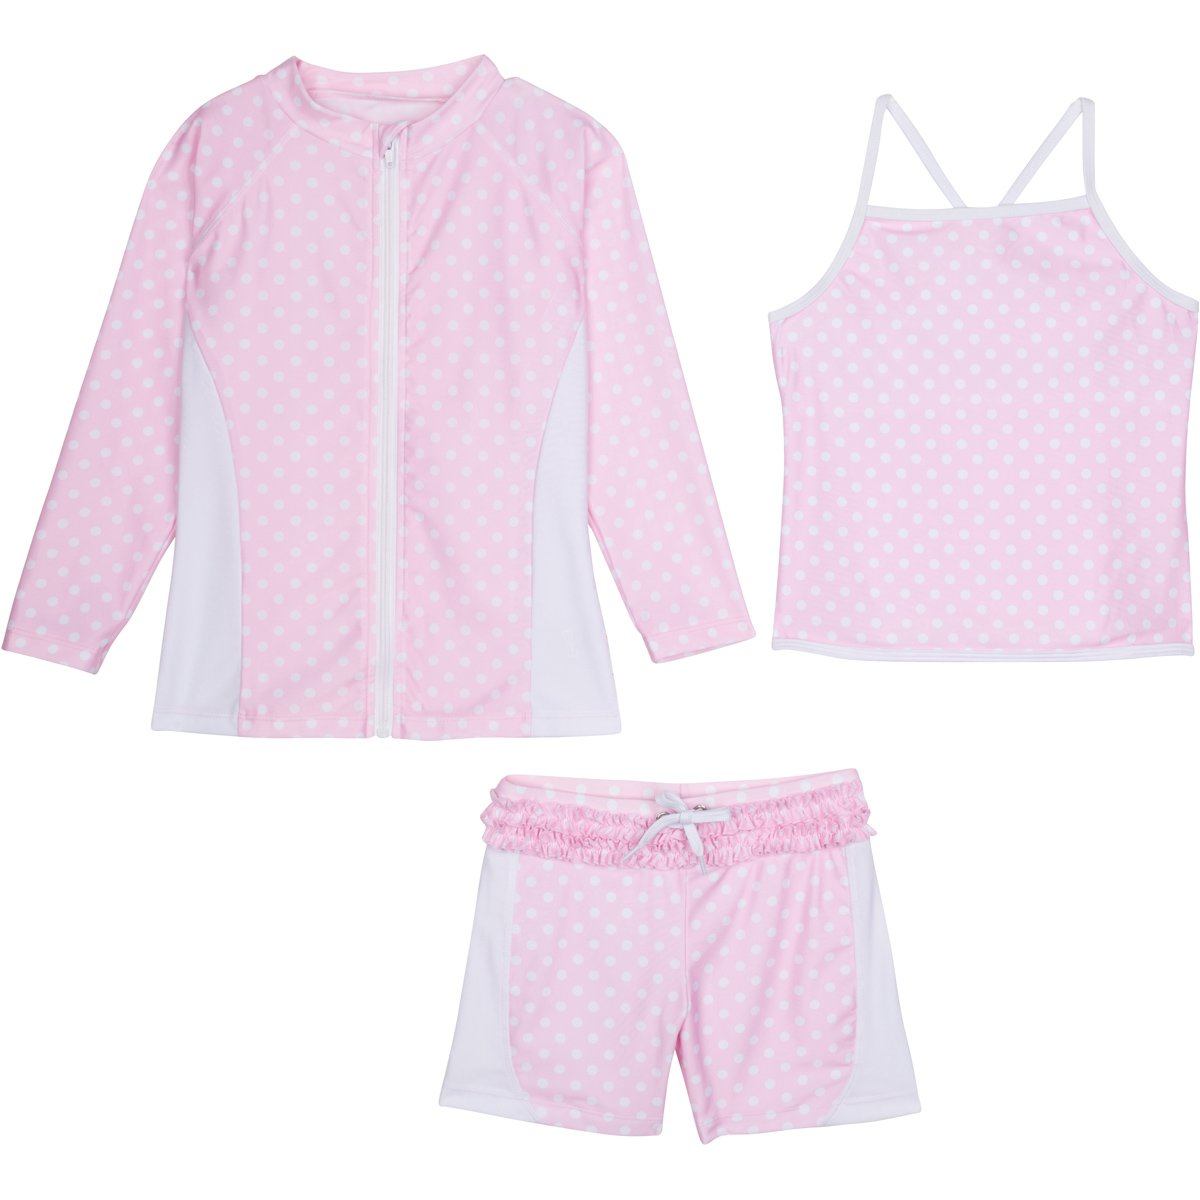 SwimZip Girls Long Sleeve Rash Guard Swim Shorts Set with UPF 50+ Pink 2T SZILSSHORTSET3PC24